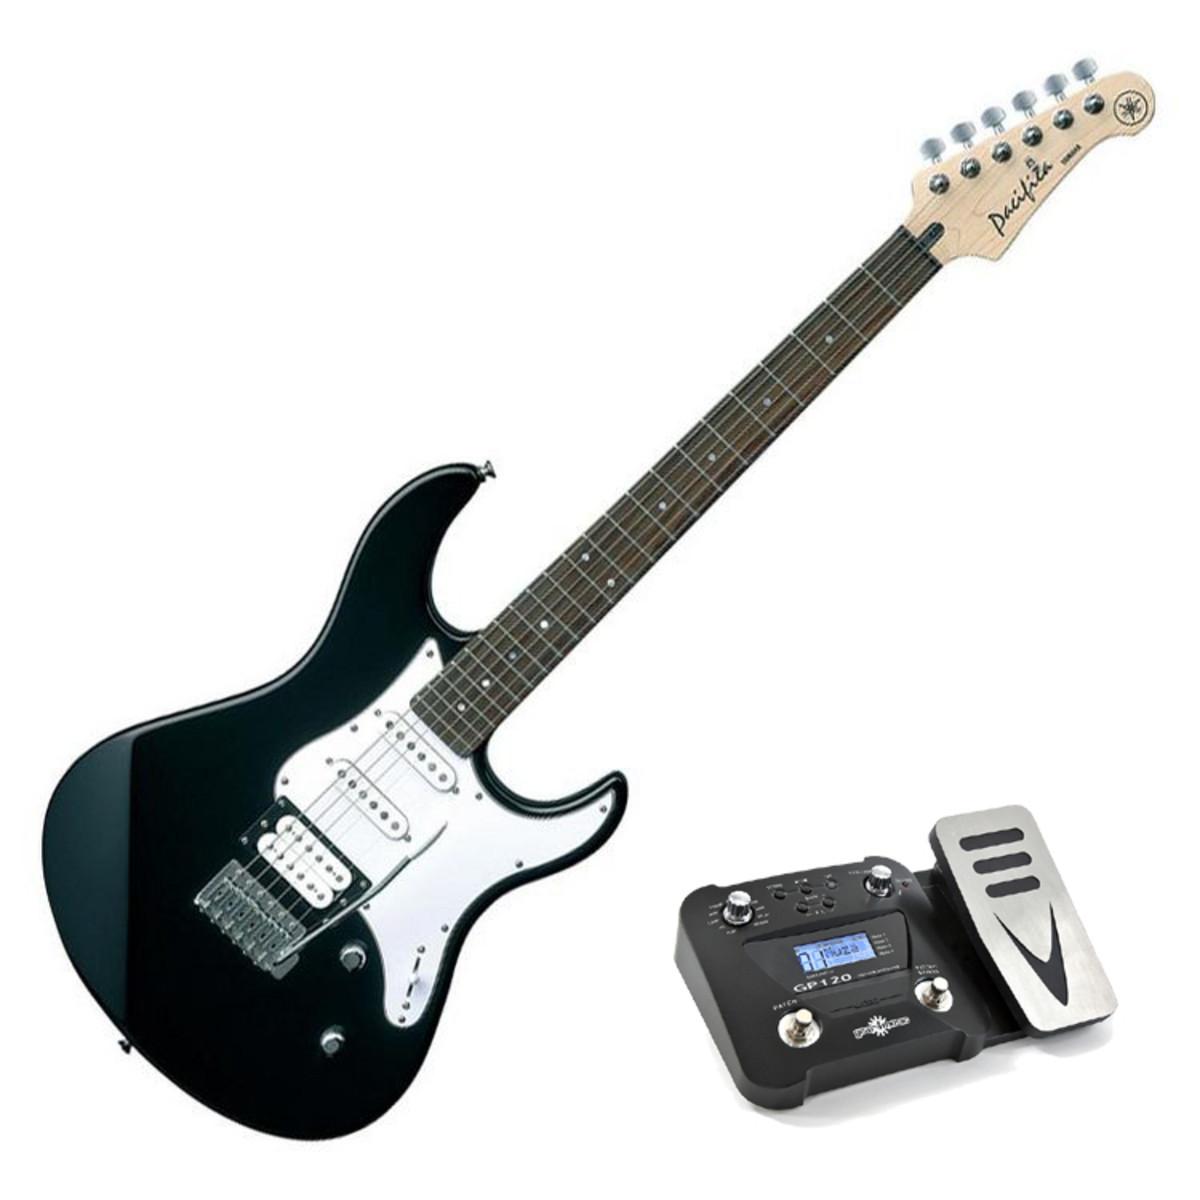 disc yamaha pacifica 112 v electric guitar black pedal pack at gear4music. Black Bedroom Furniture Sets. Home Design Ideas